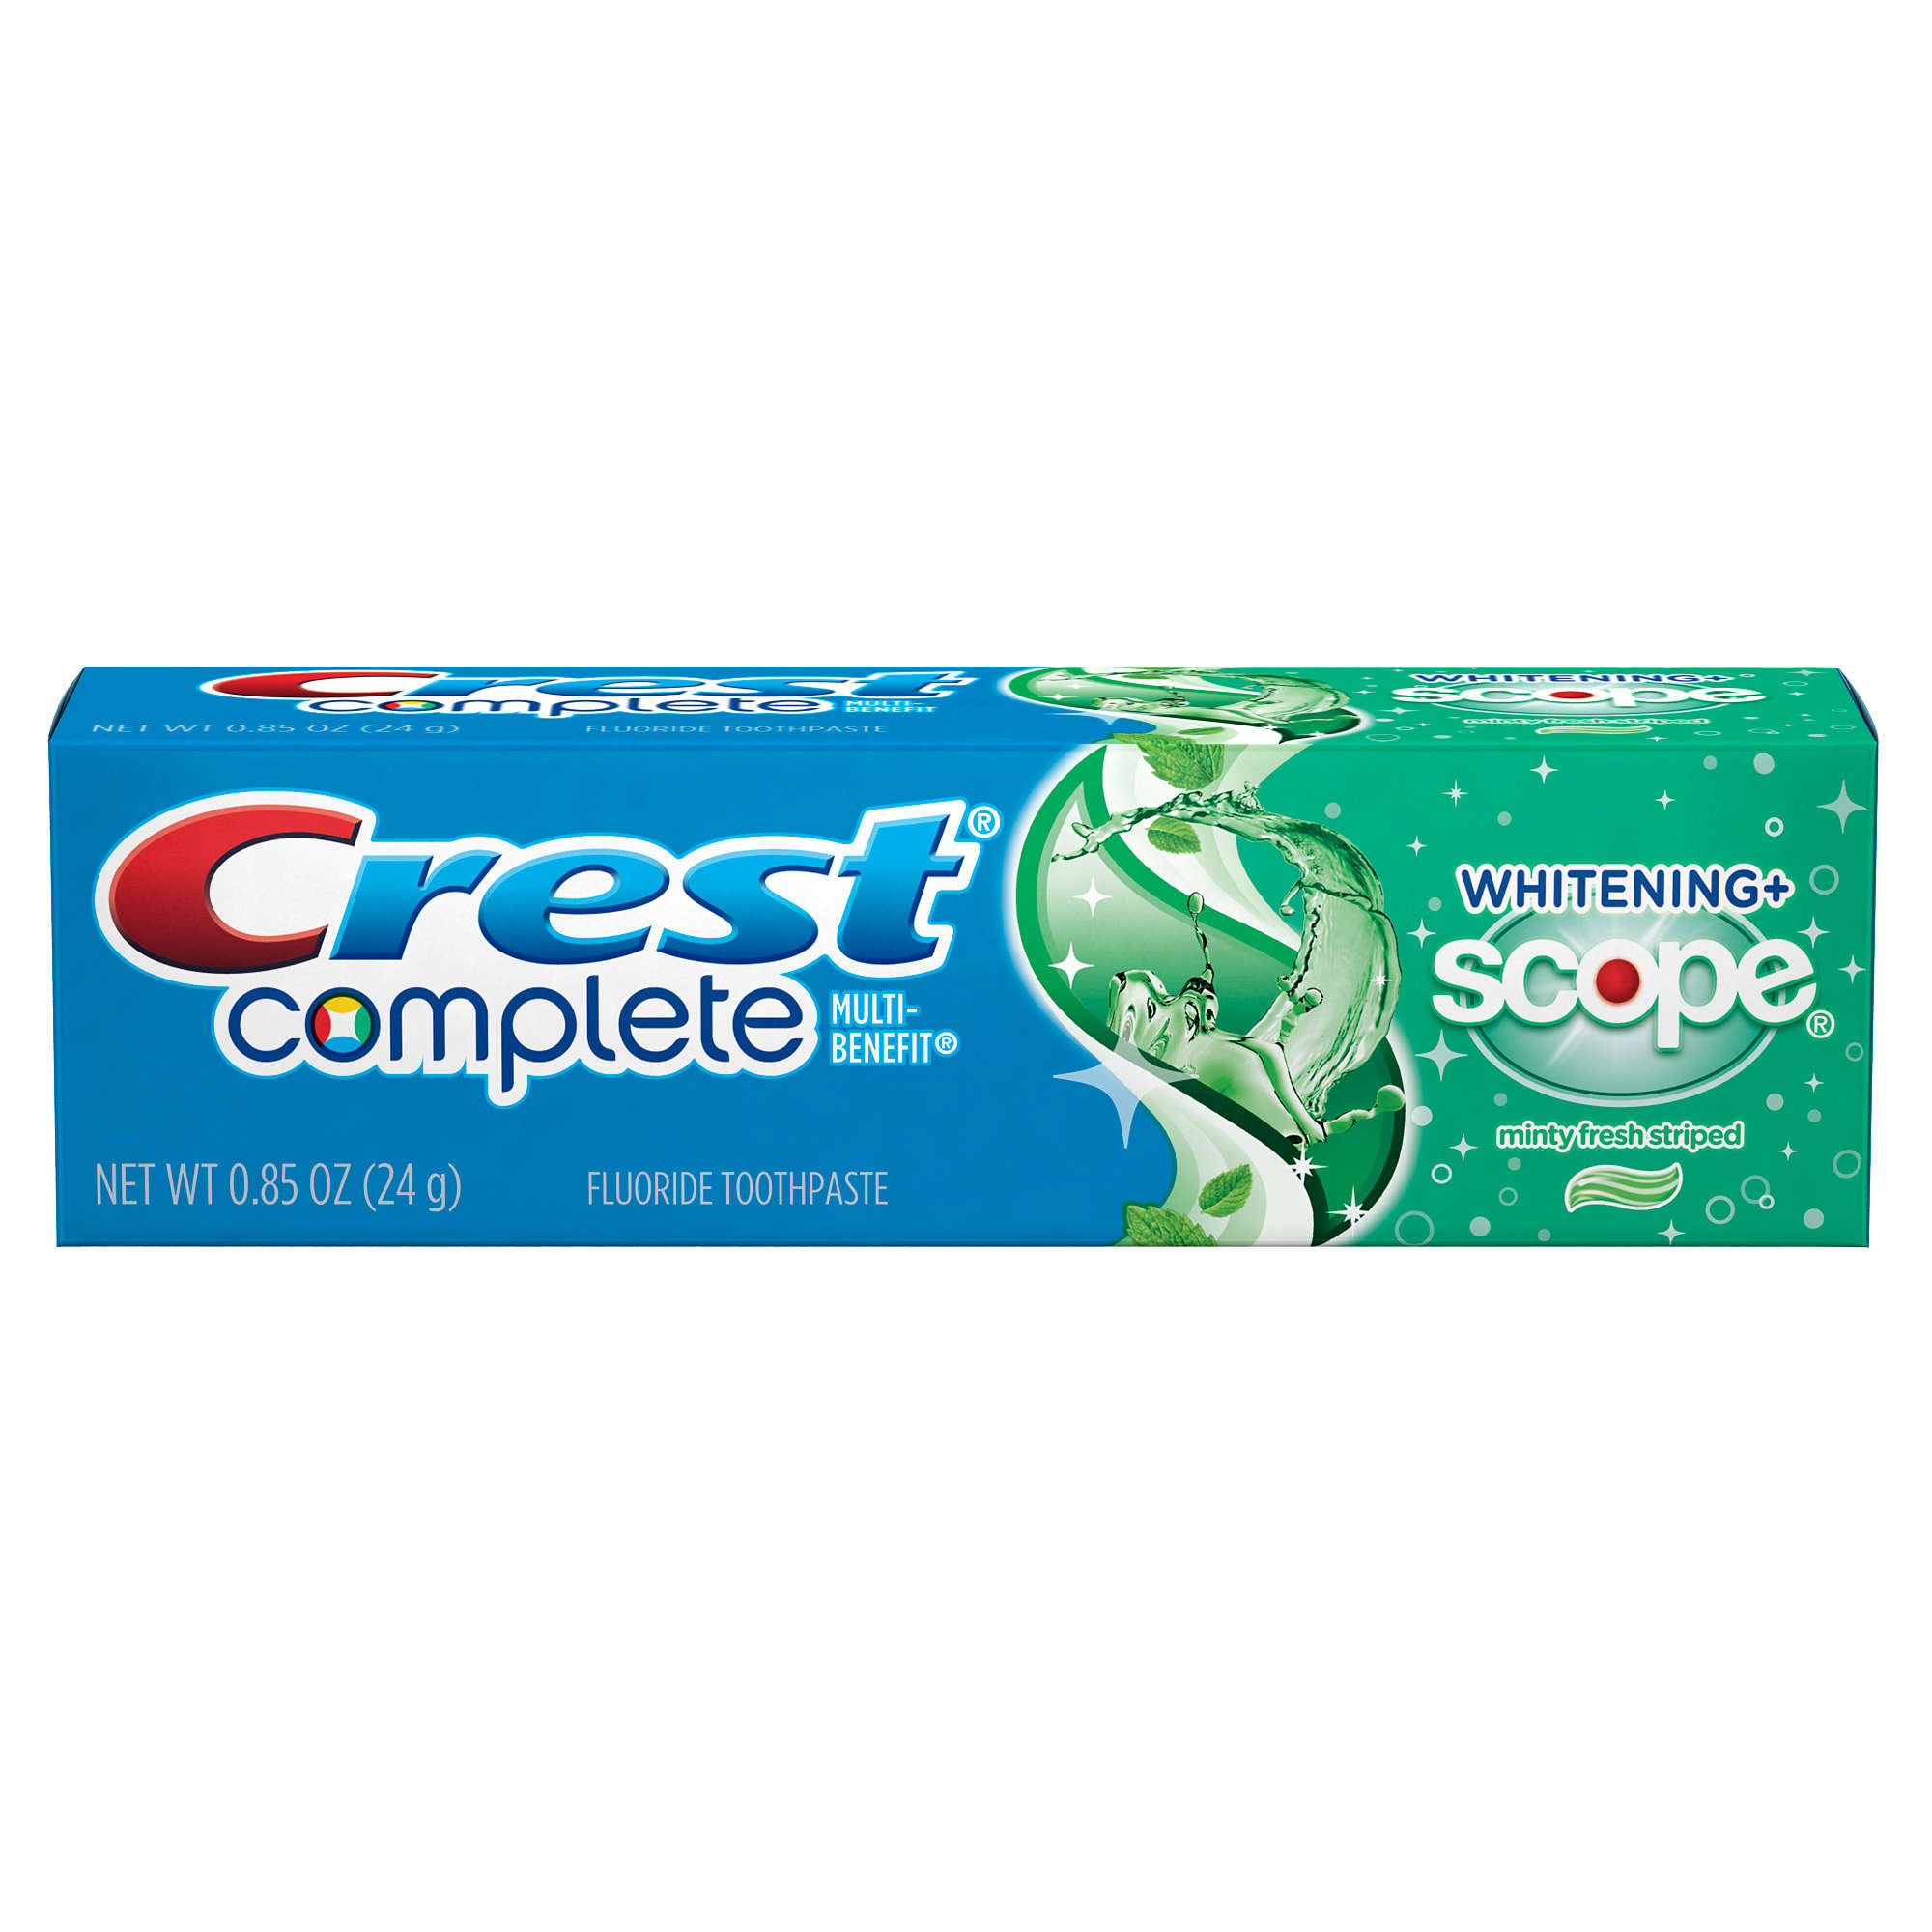 Crest Complete Whitening Plus Scope Toothpaste